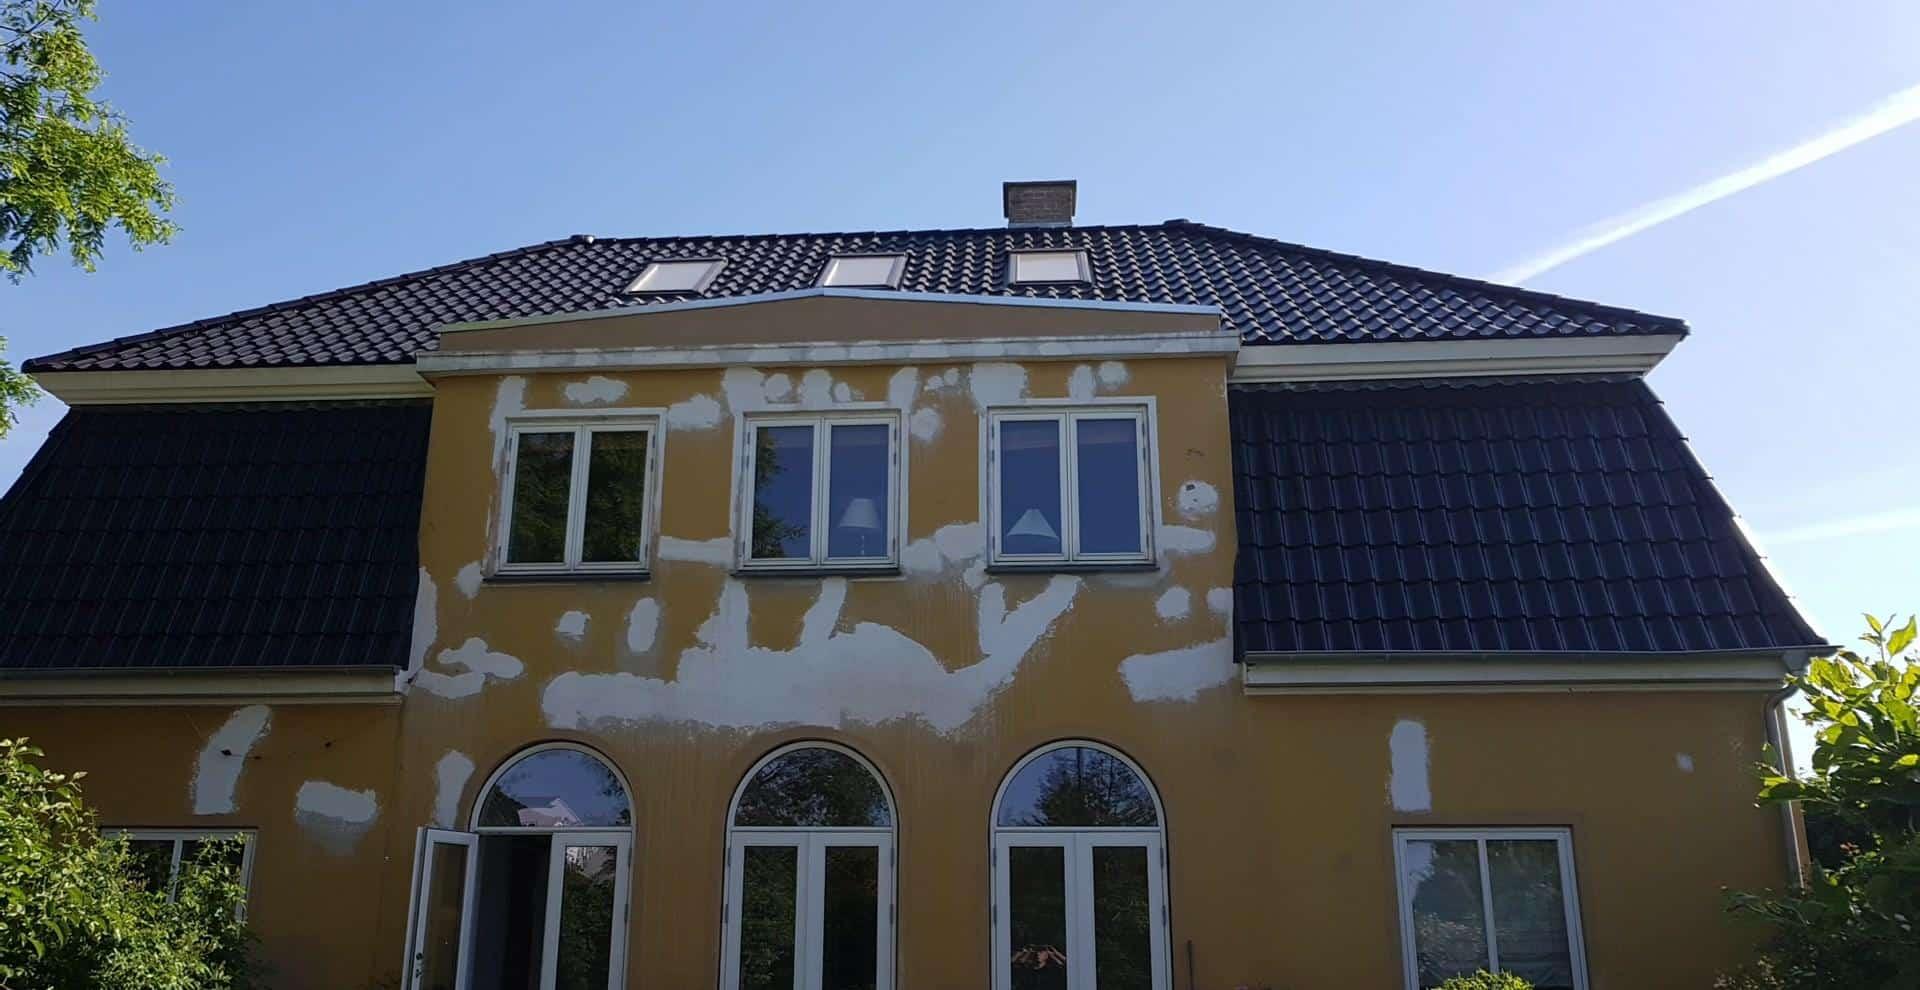 nyt-flot-tegltag-hilleroed-1